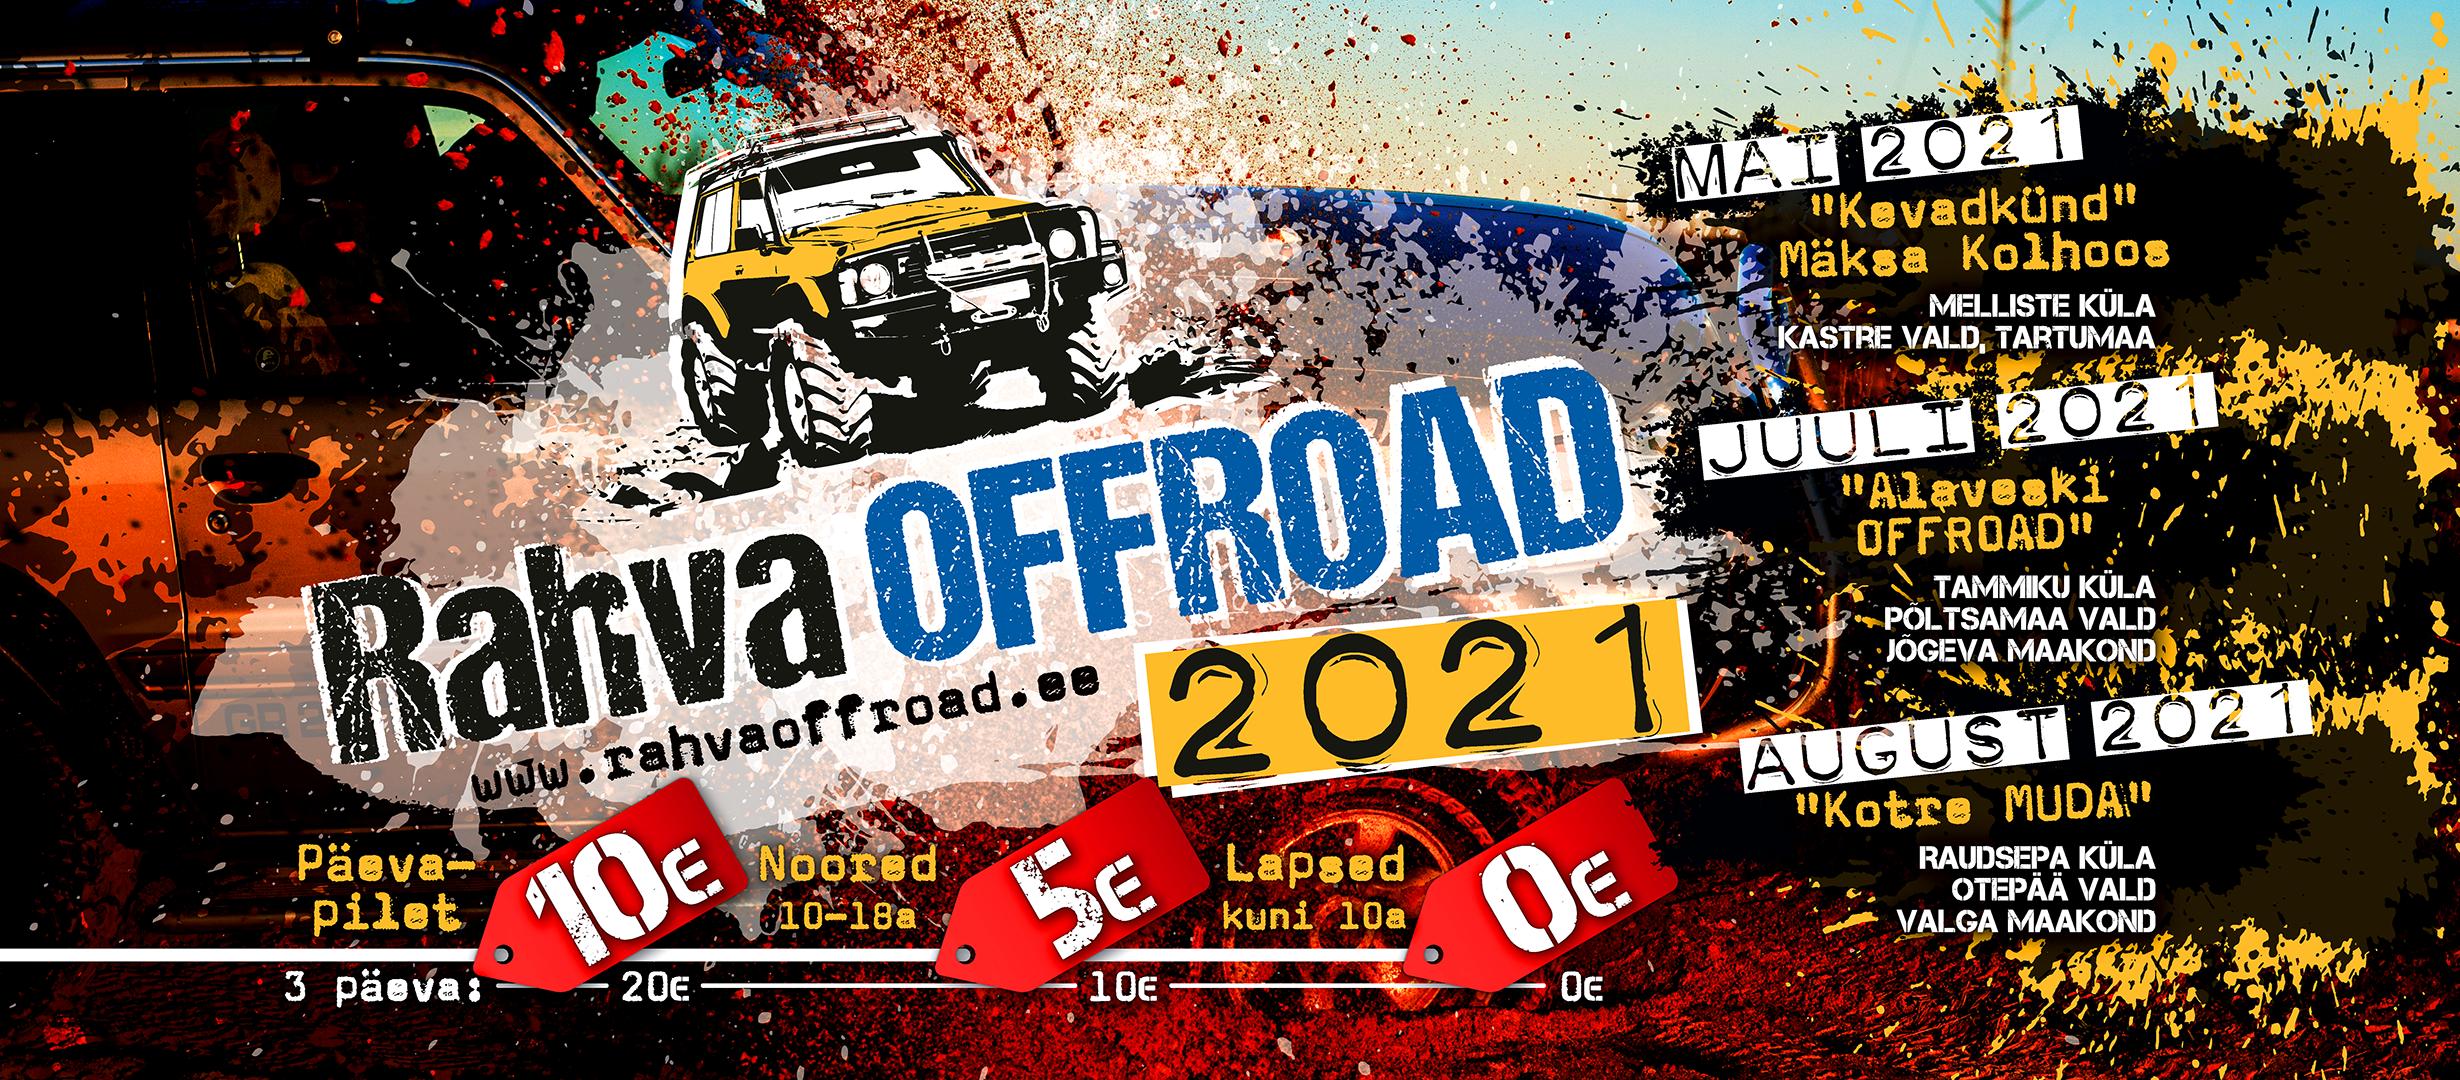 Combipact - Rahva Offroad 2021